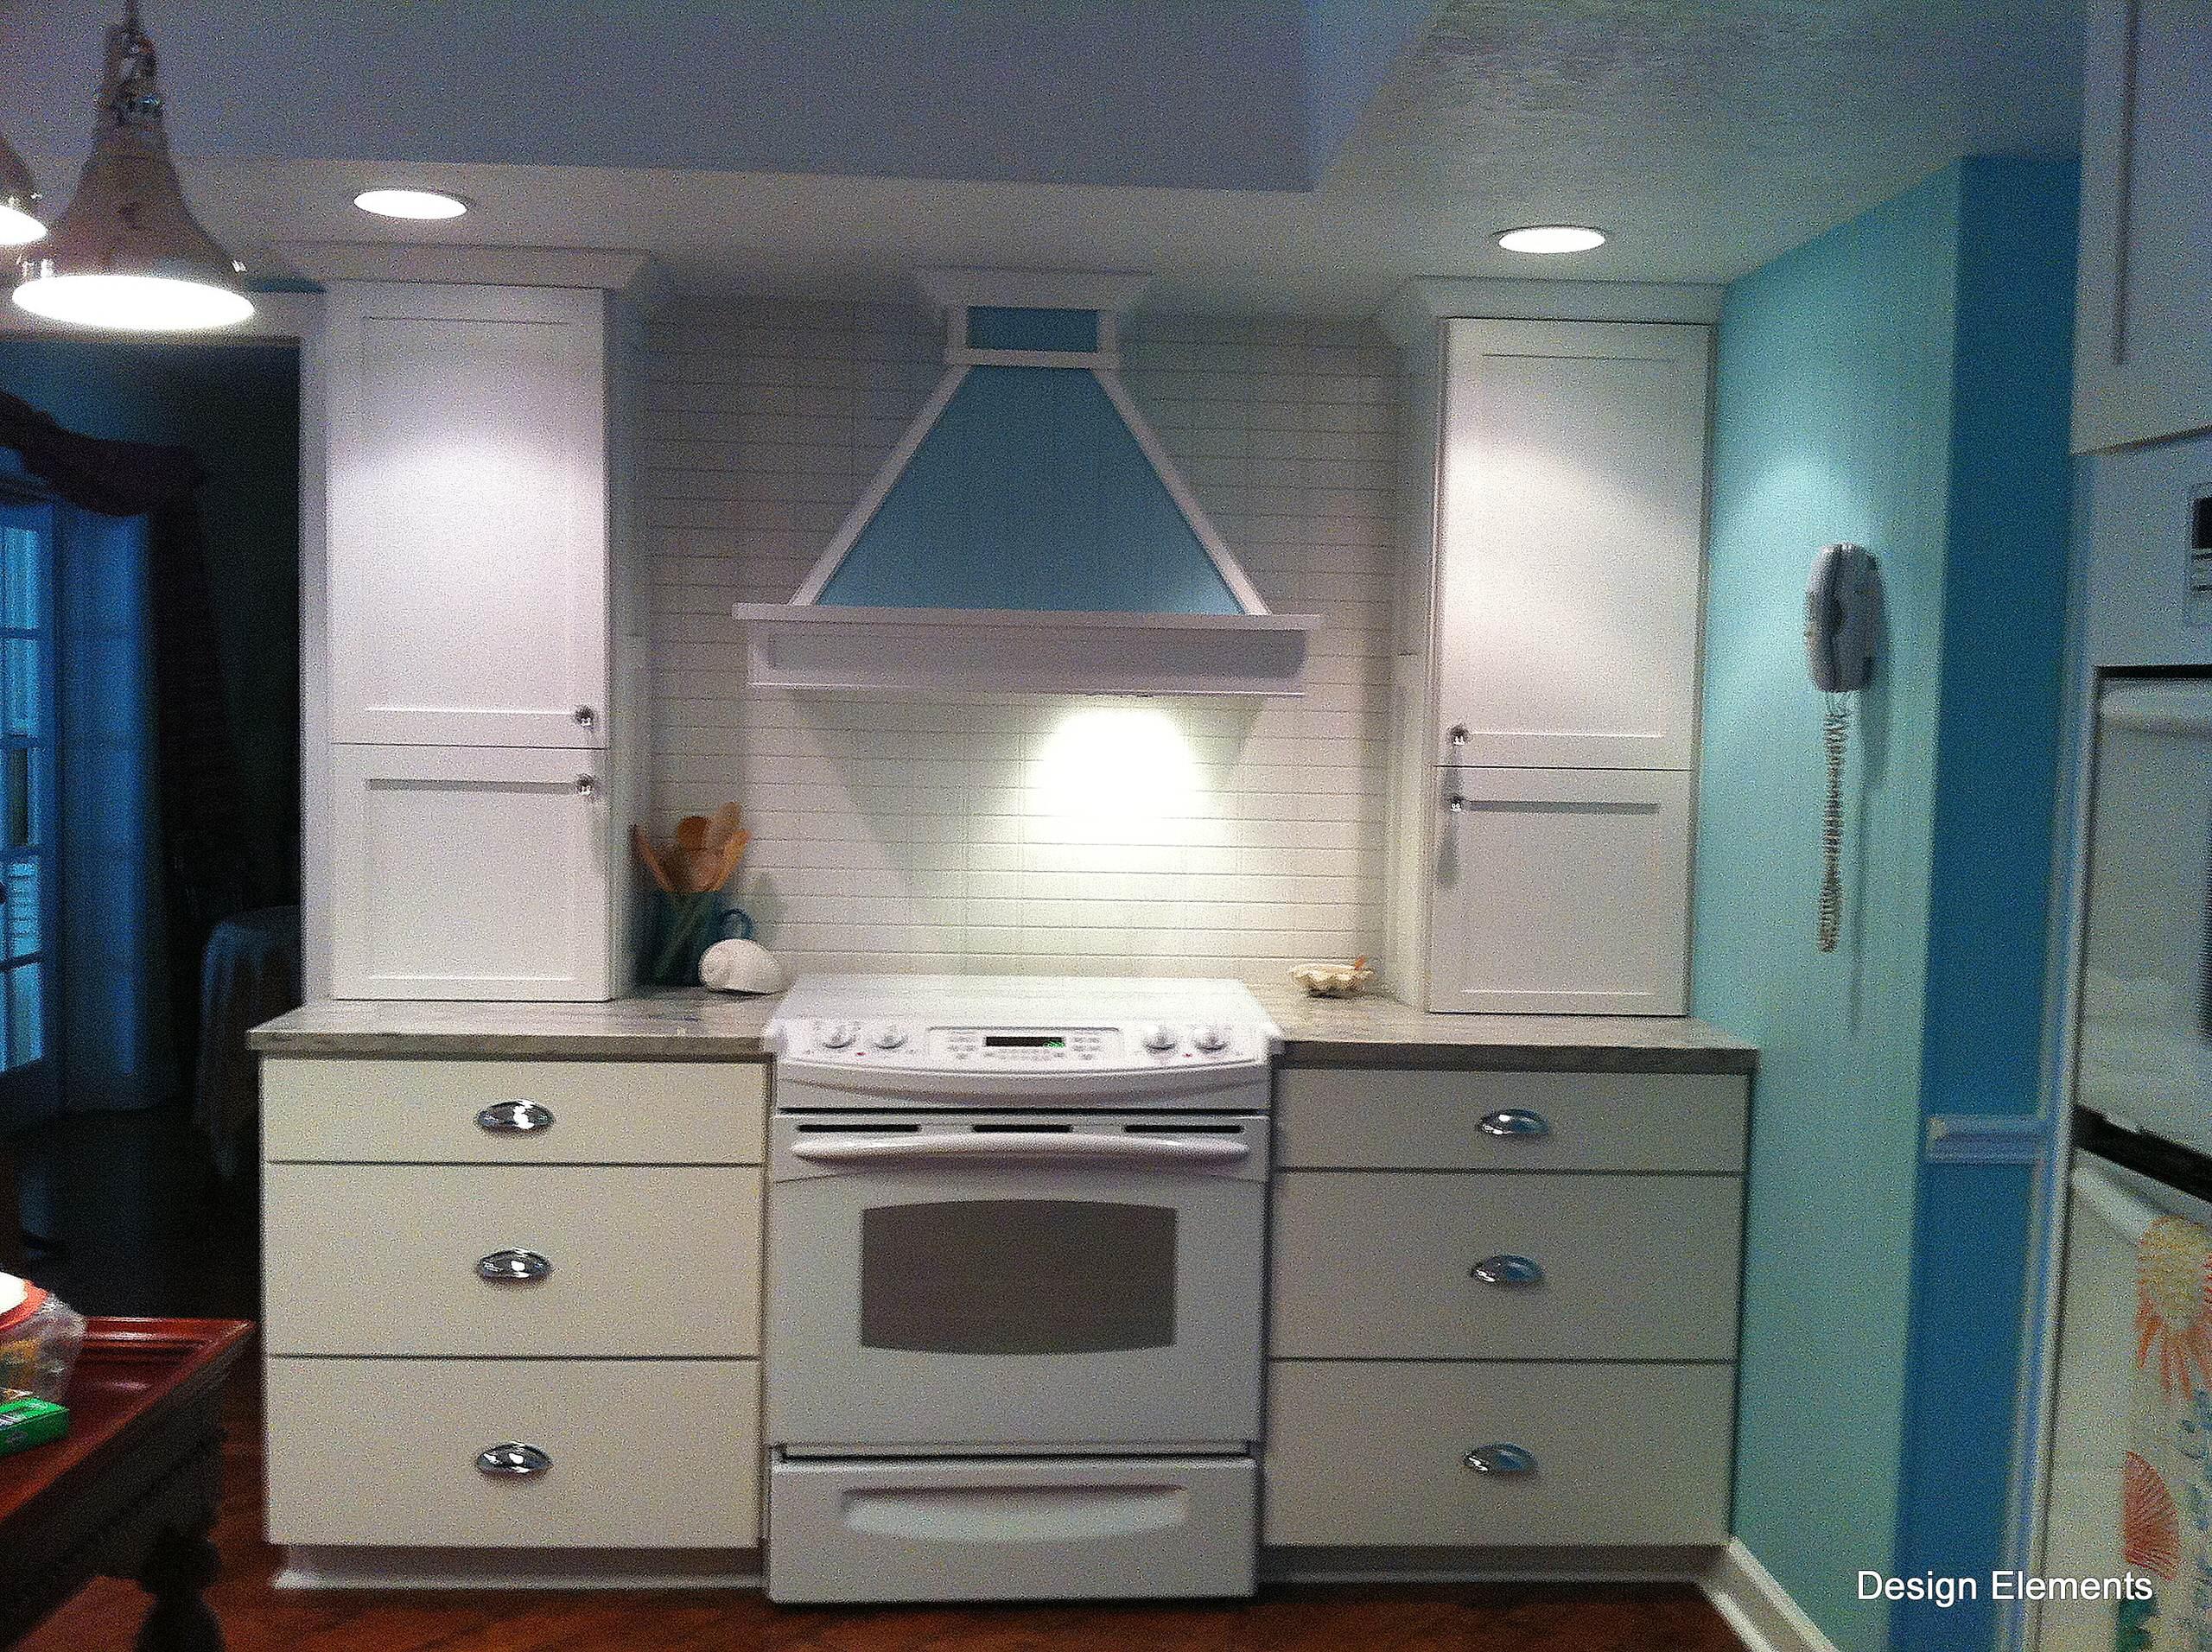 Grovewood Kitchen Renovation